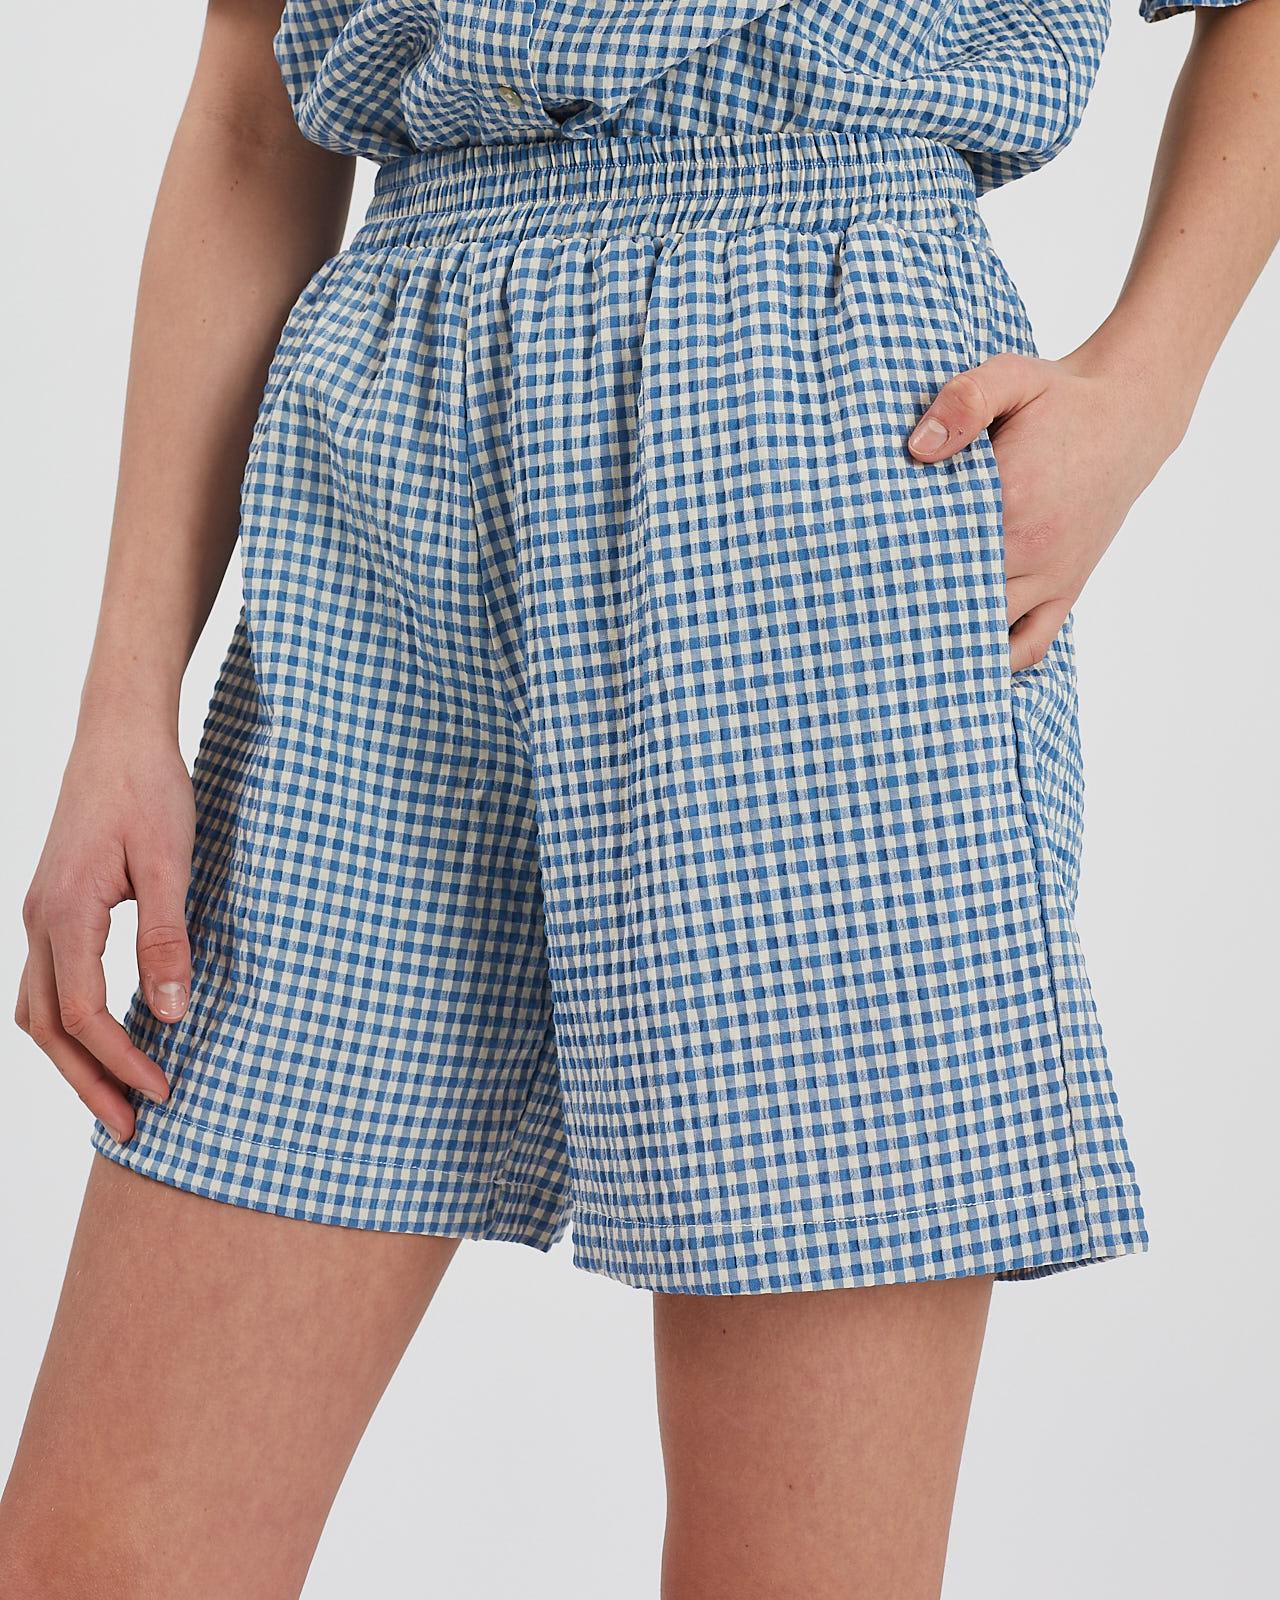 Moves Pynna shorts, blue bell, 34